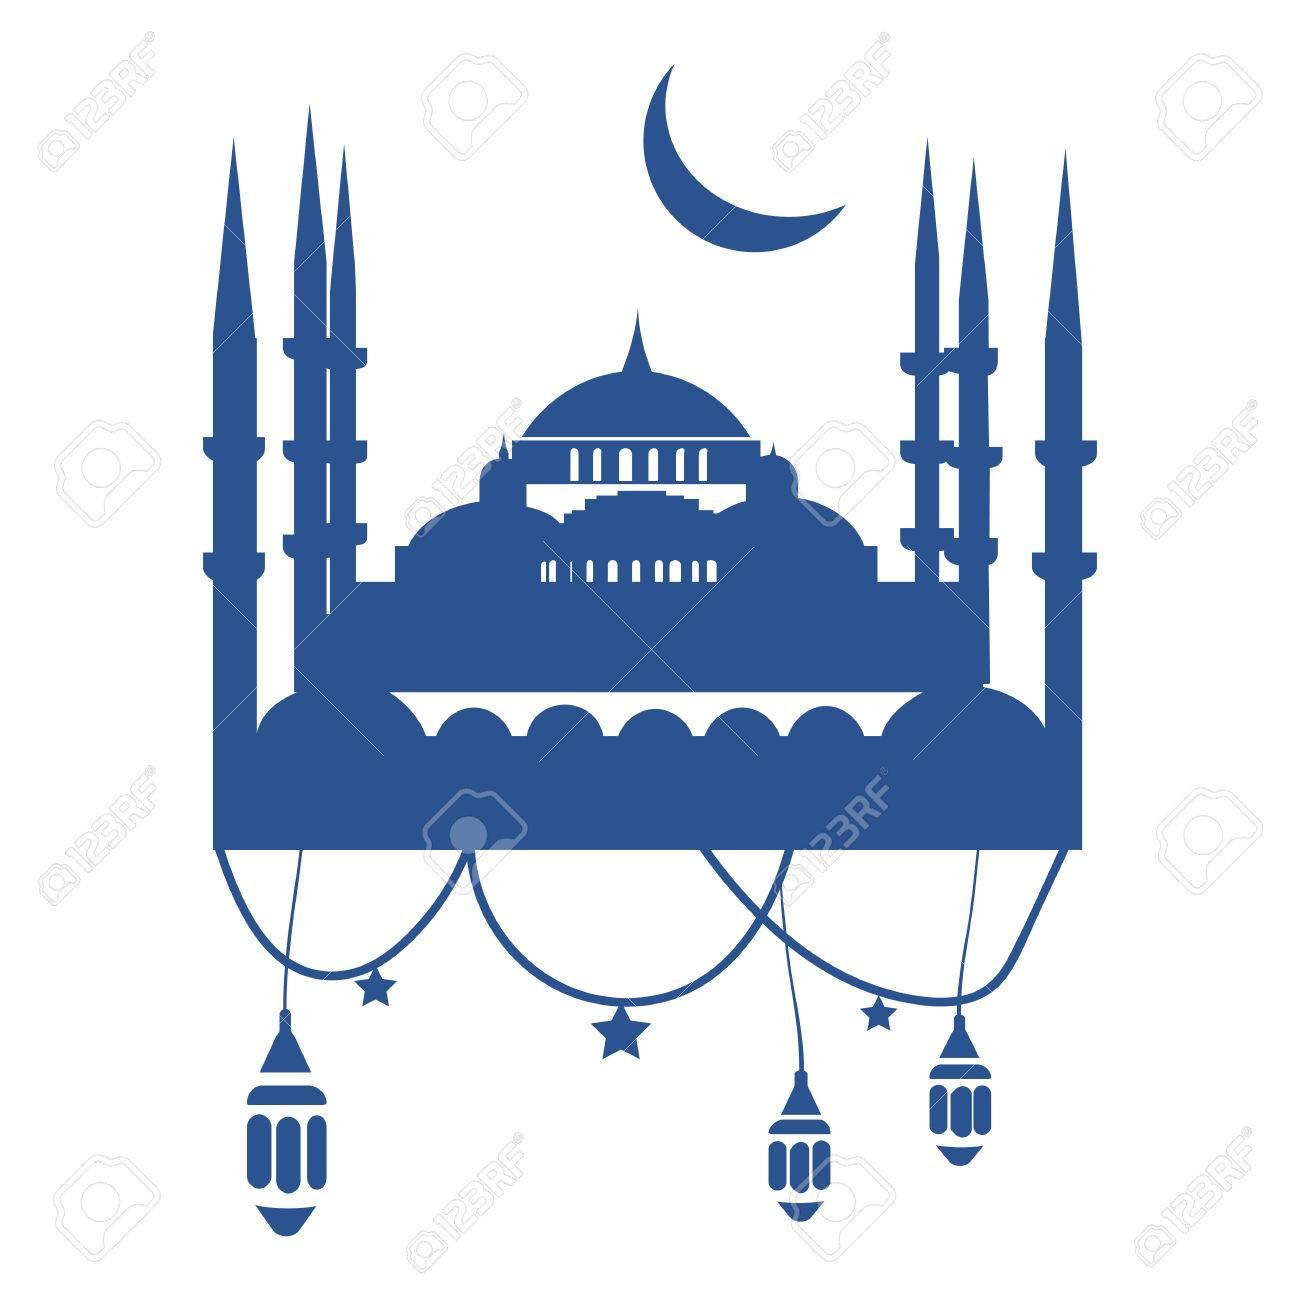 Ramadan Mubarak Or Kareem Greeting Card Template The Ninth Month Of